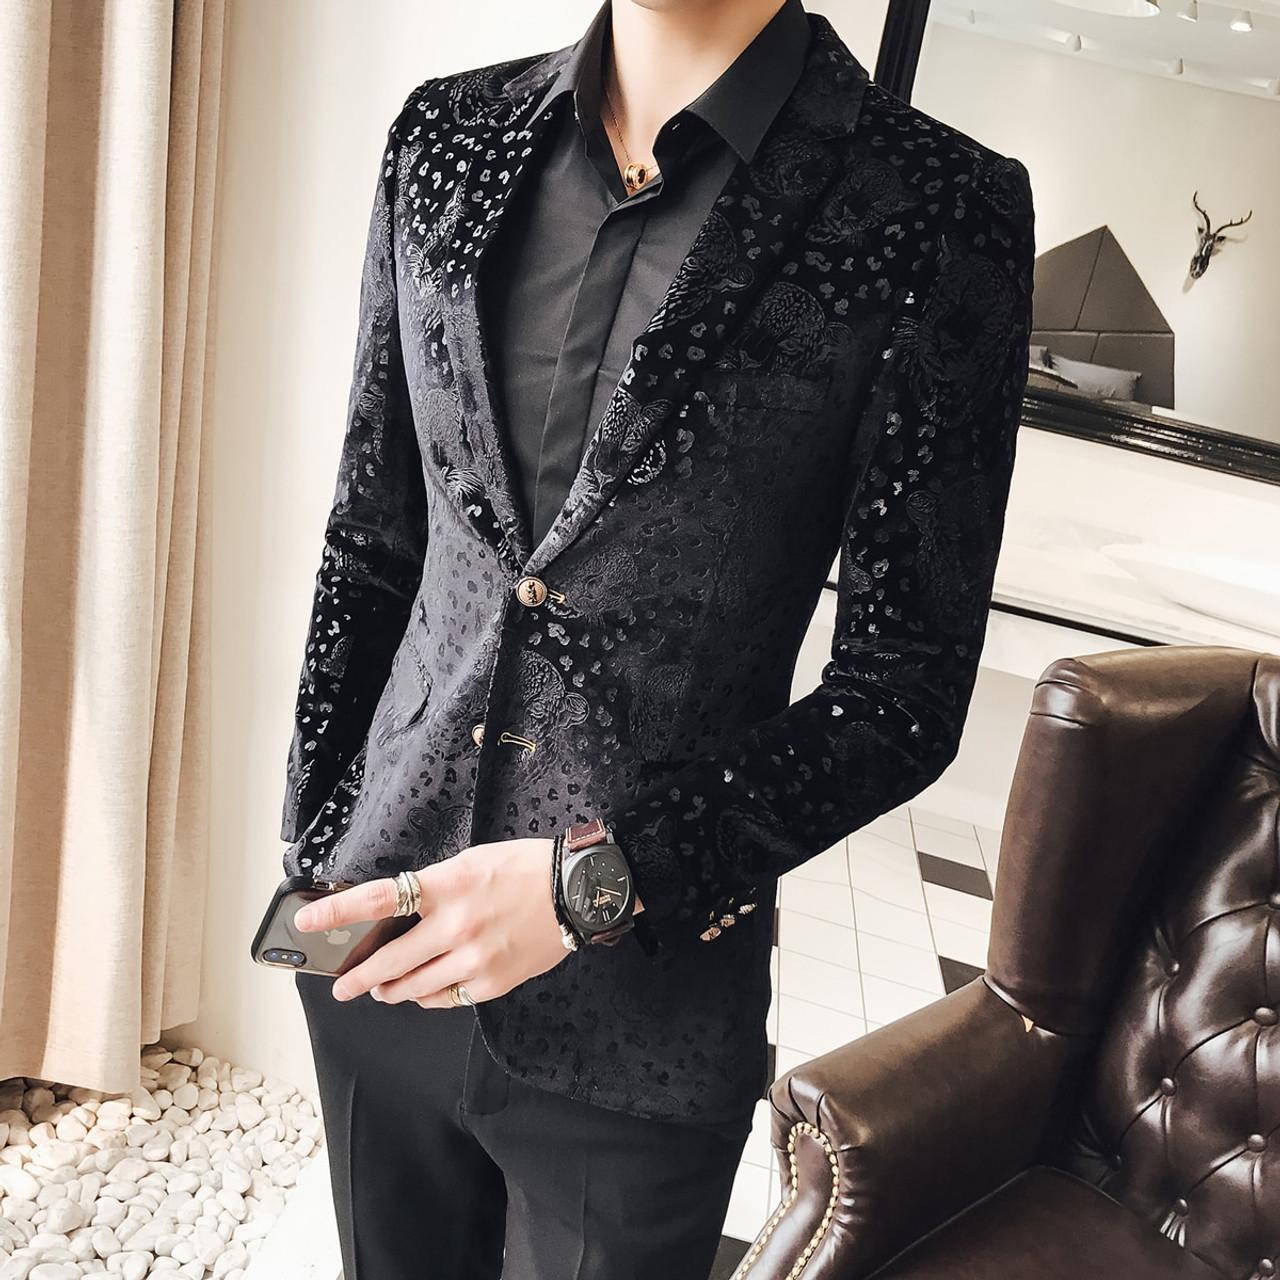 b3fe3c4a3 Black Velvet Blazer Men Male Suit Jacket Casual Business Flower Pattern  Luxury Stylish Blazers For Men Party Wedding Blazer